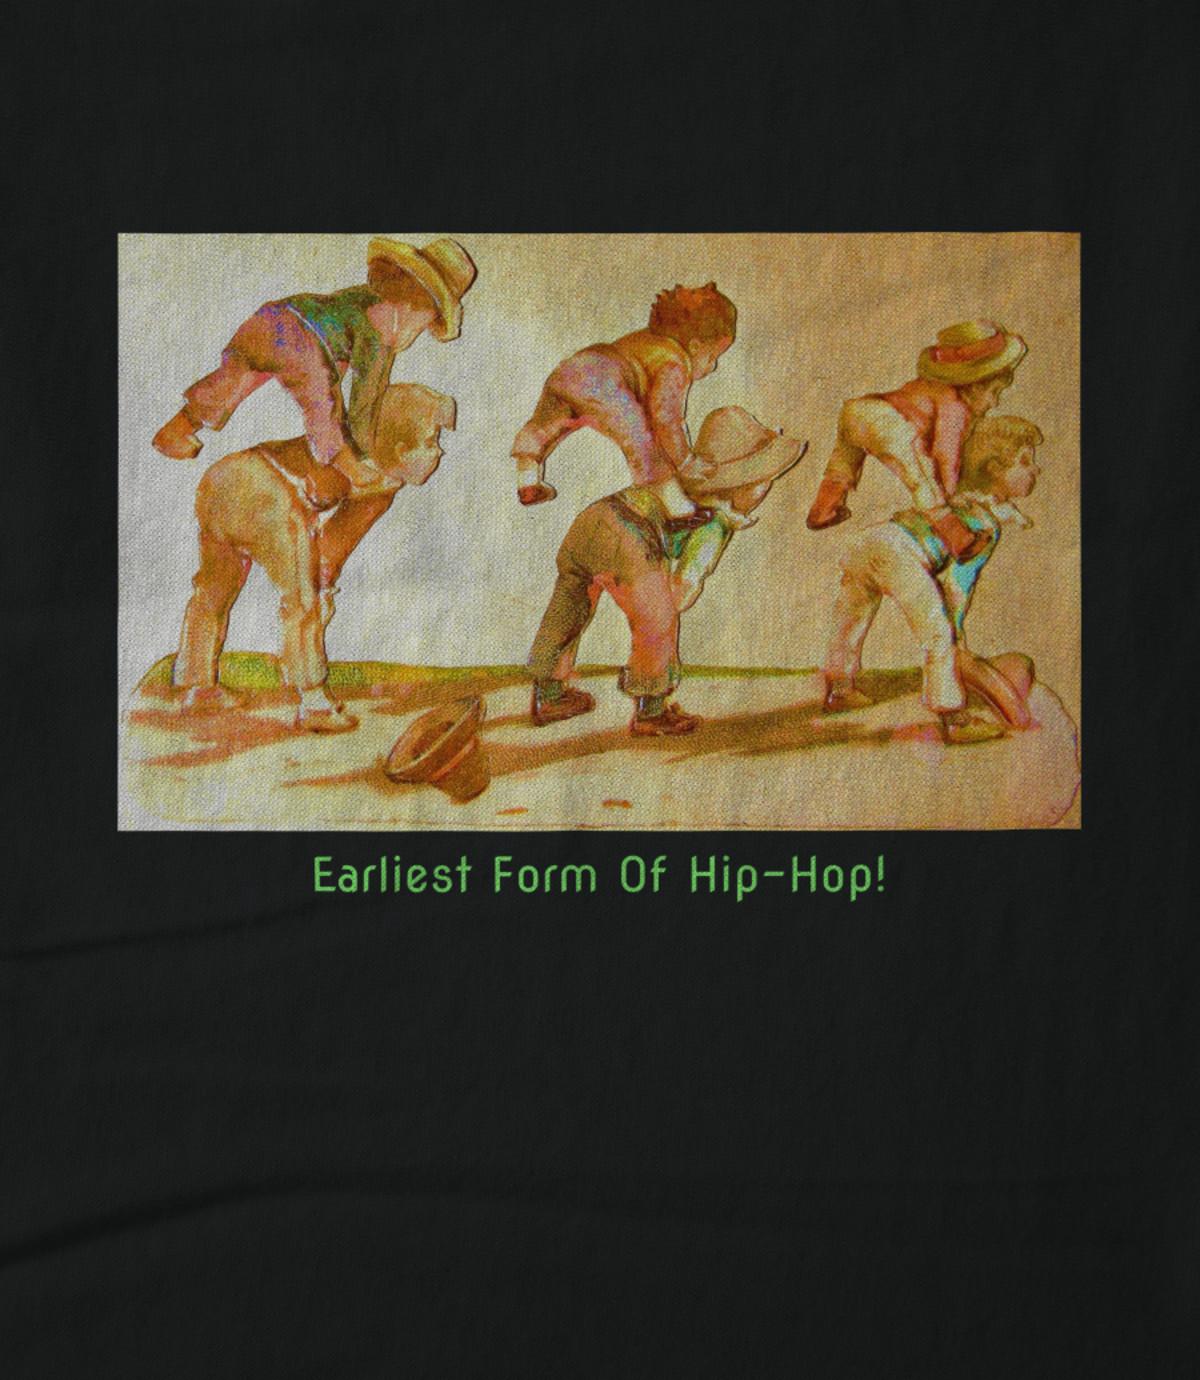 Matthew f  blowers iii earliest form of hip hop  1505832352